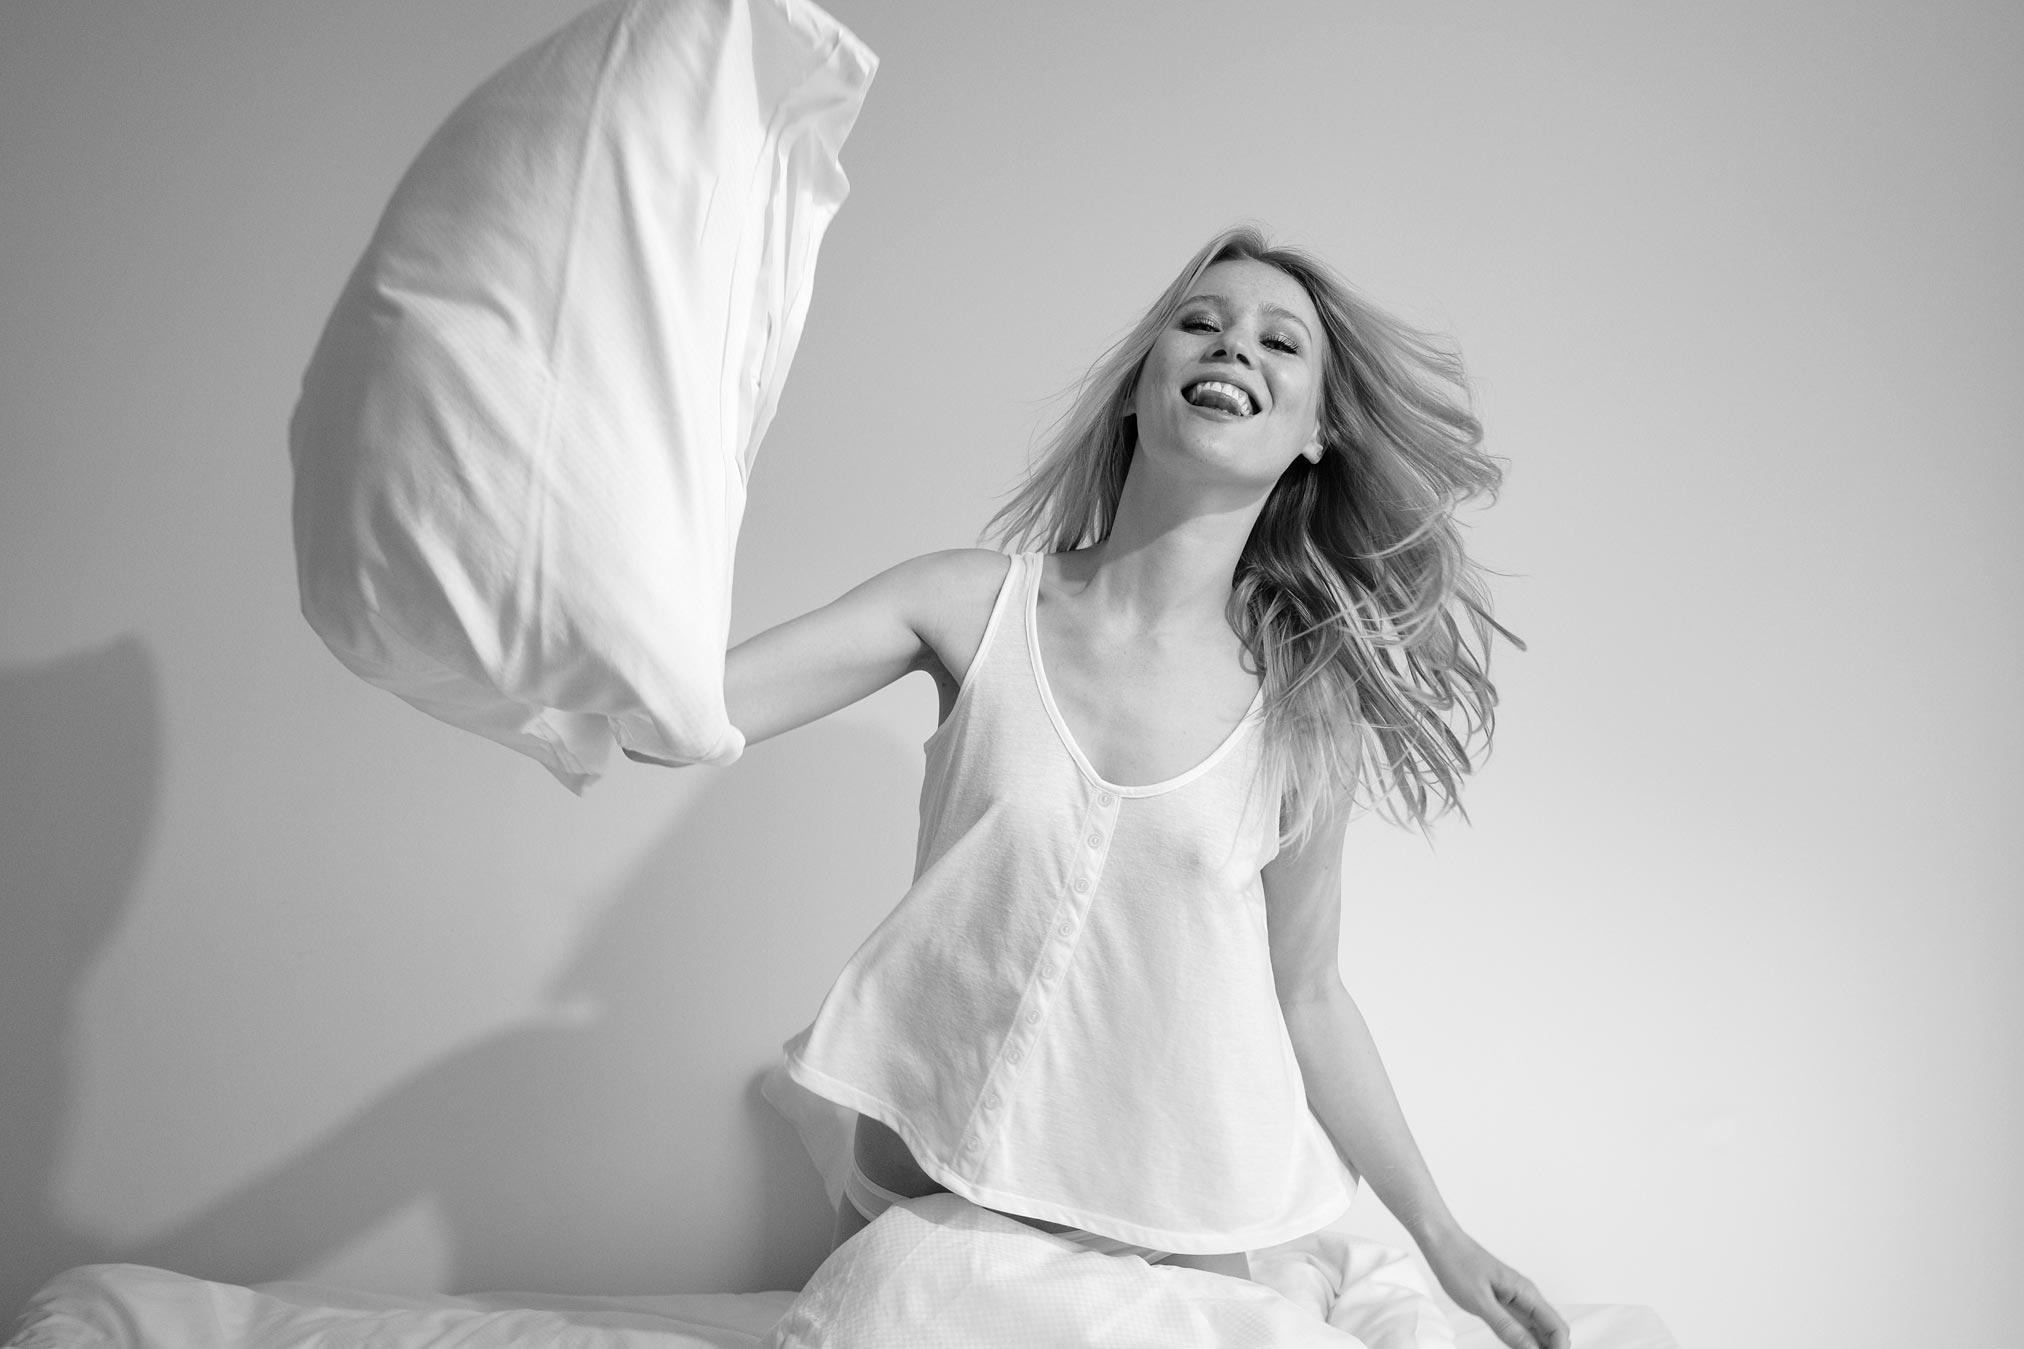 Melanie Beckendorff-Leavens having a pillow fight in an apartment in Copenhagen. Monochrome print by Damien Lovegrove